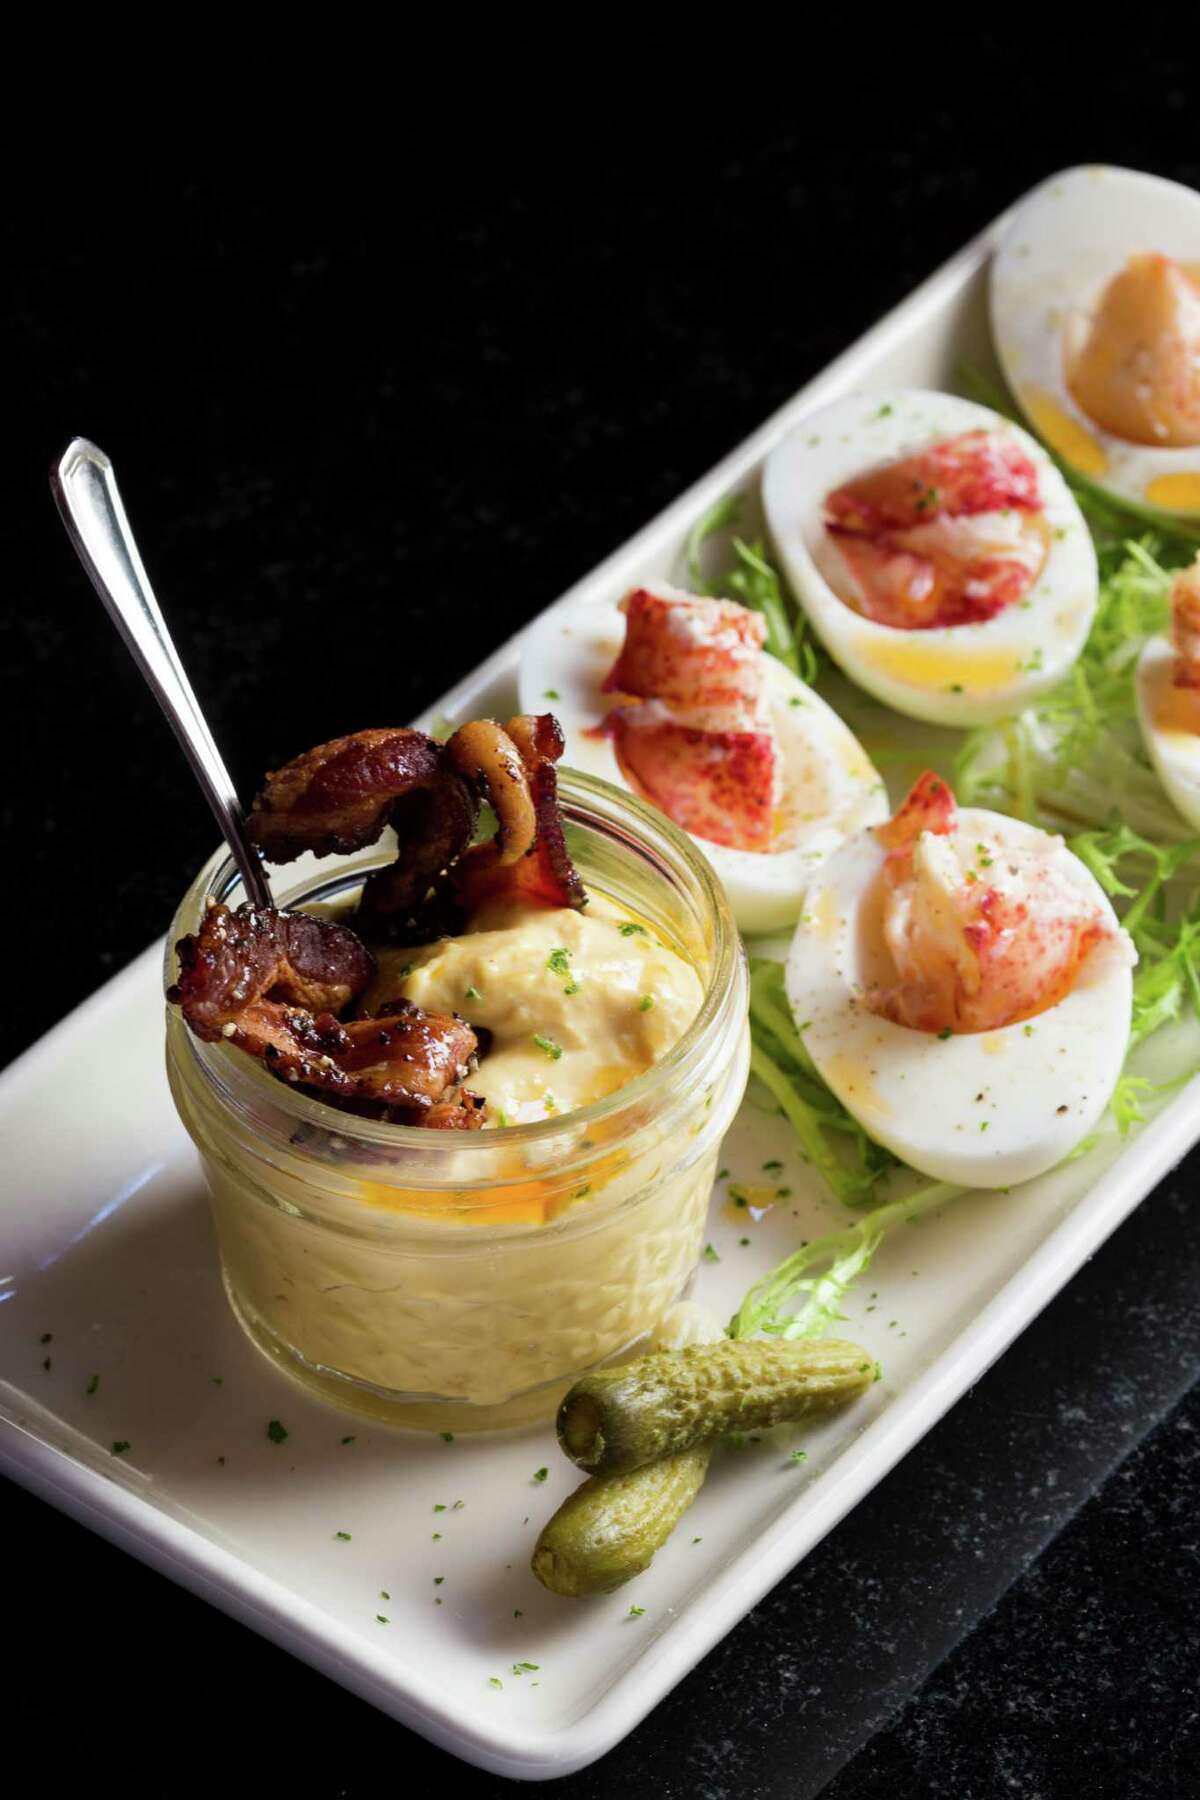 Lobster deviled eggs at Pappas Bros. Steakhouse